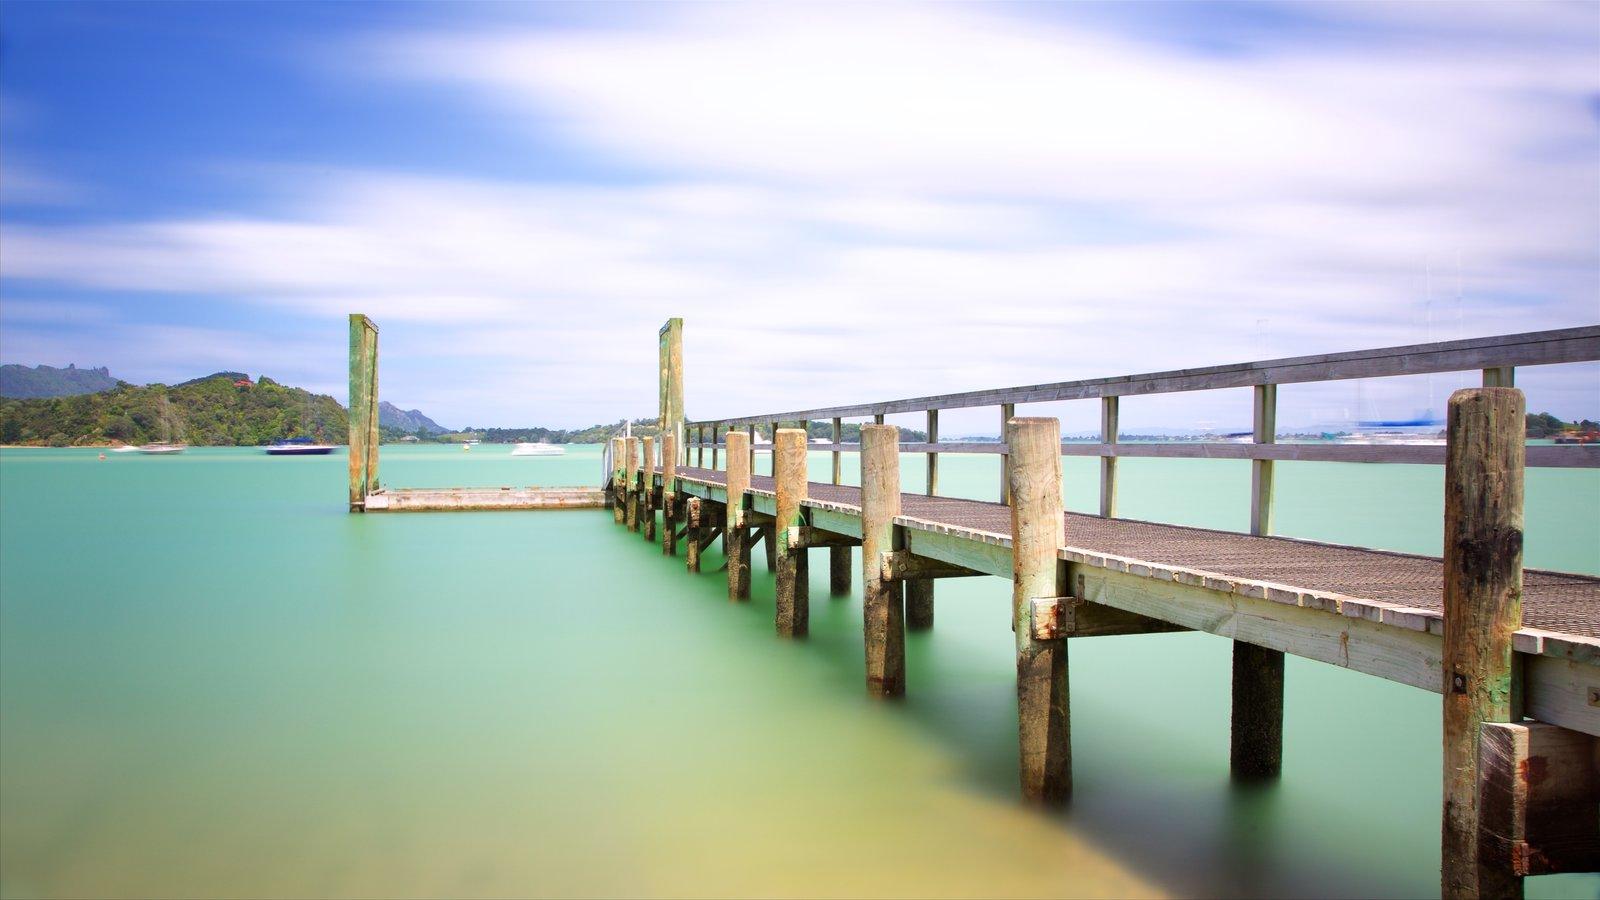 Whangarei Heads mostrando una bahía o puerto